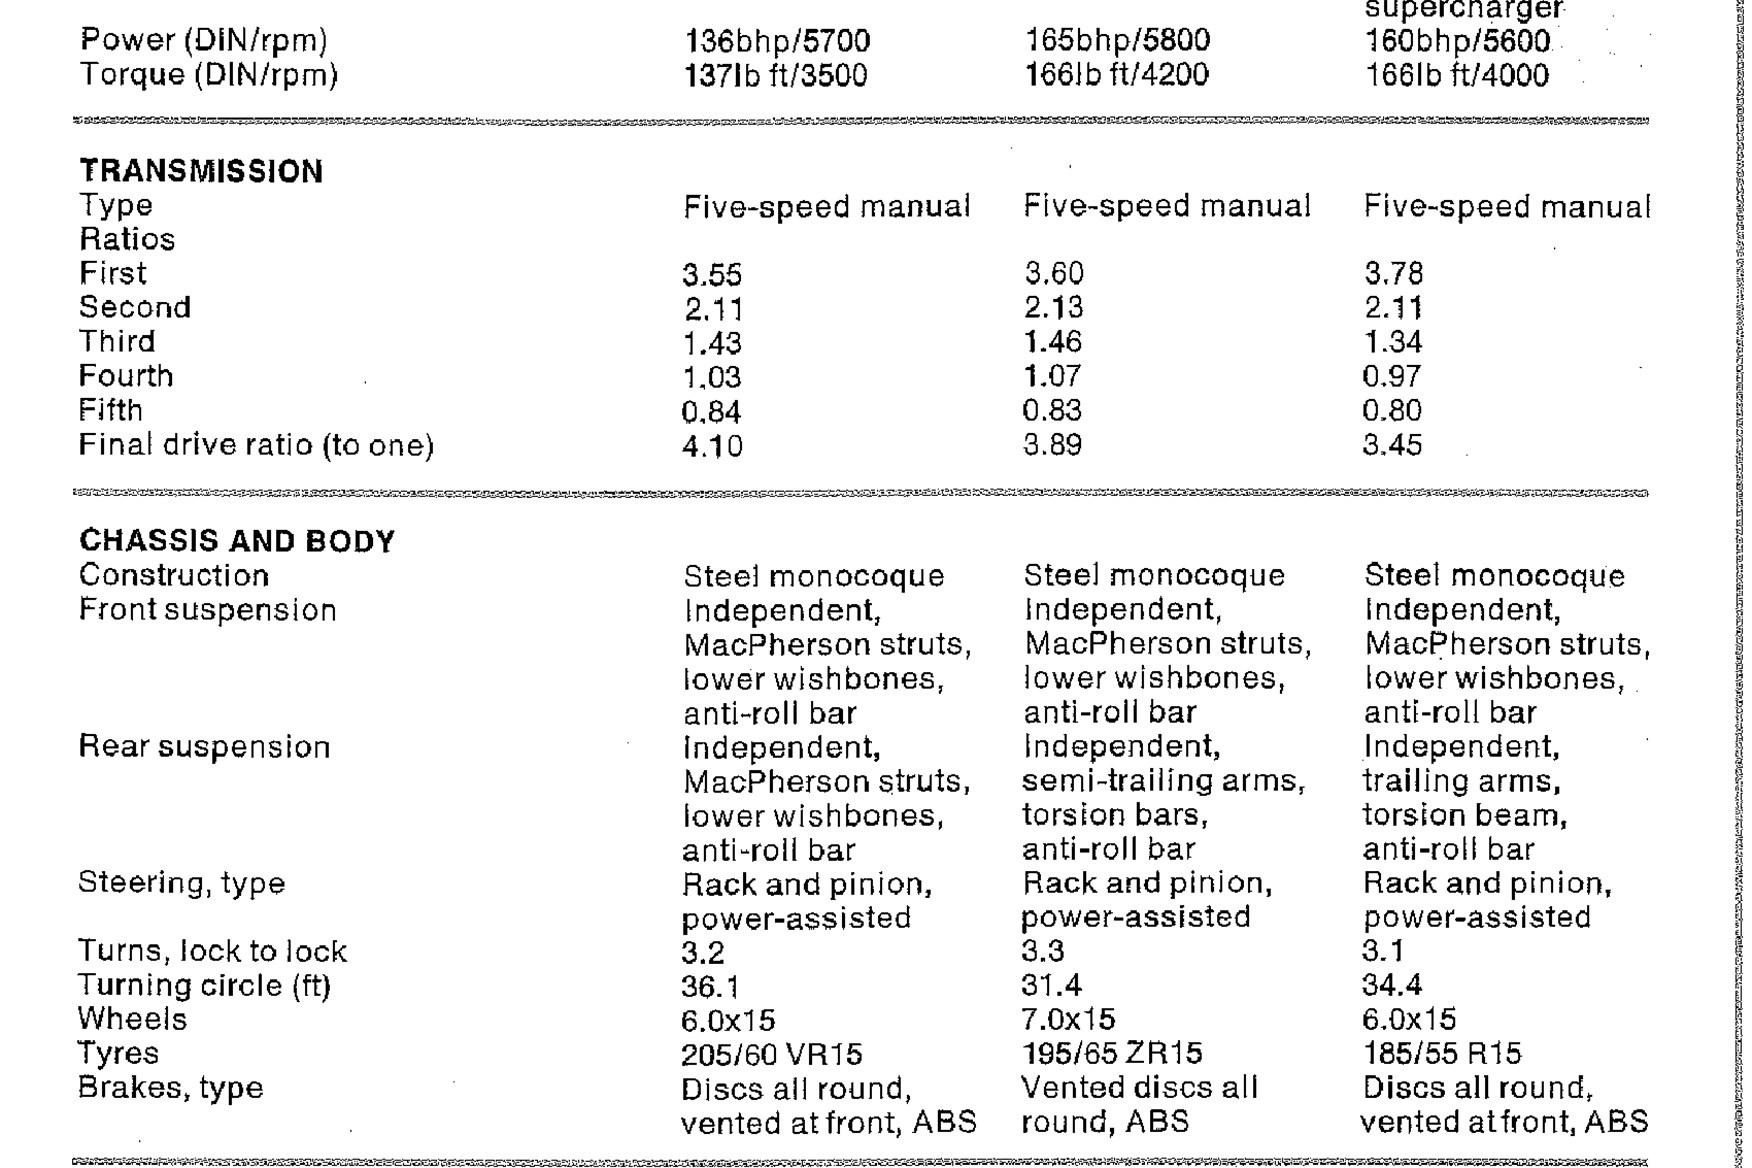 Porsche 944 Alternator Wiring Diagram Electrical Diagrams Engine 81 Schematics Honda Prelude The